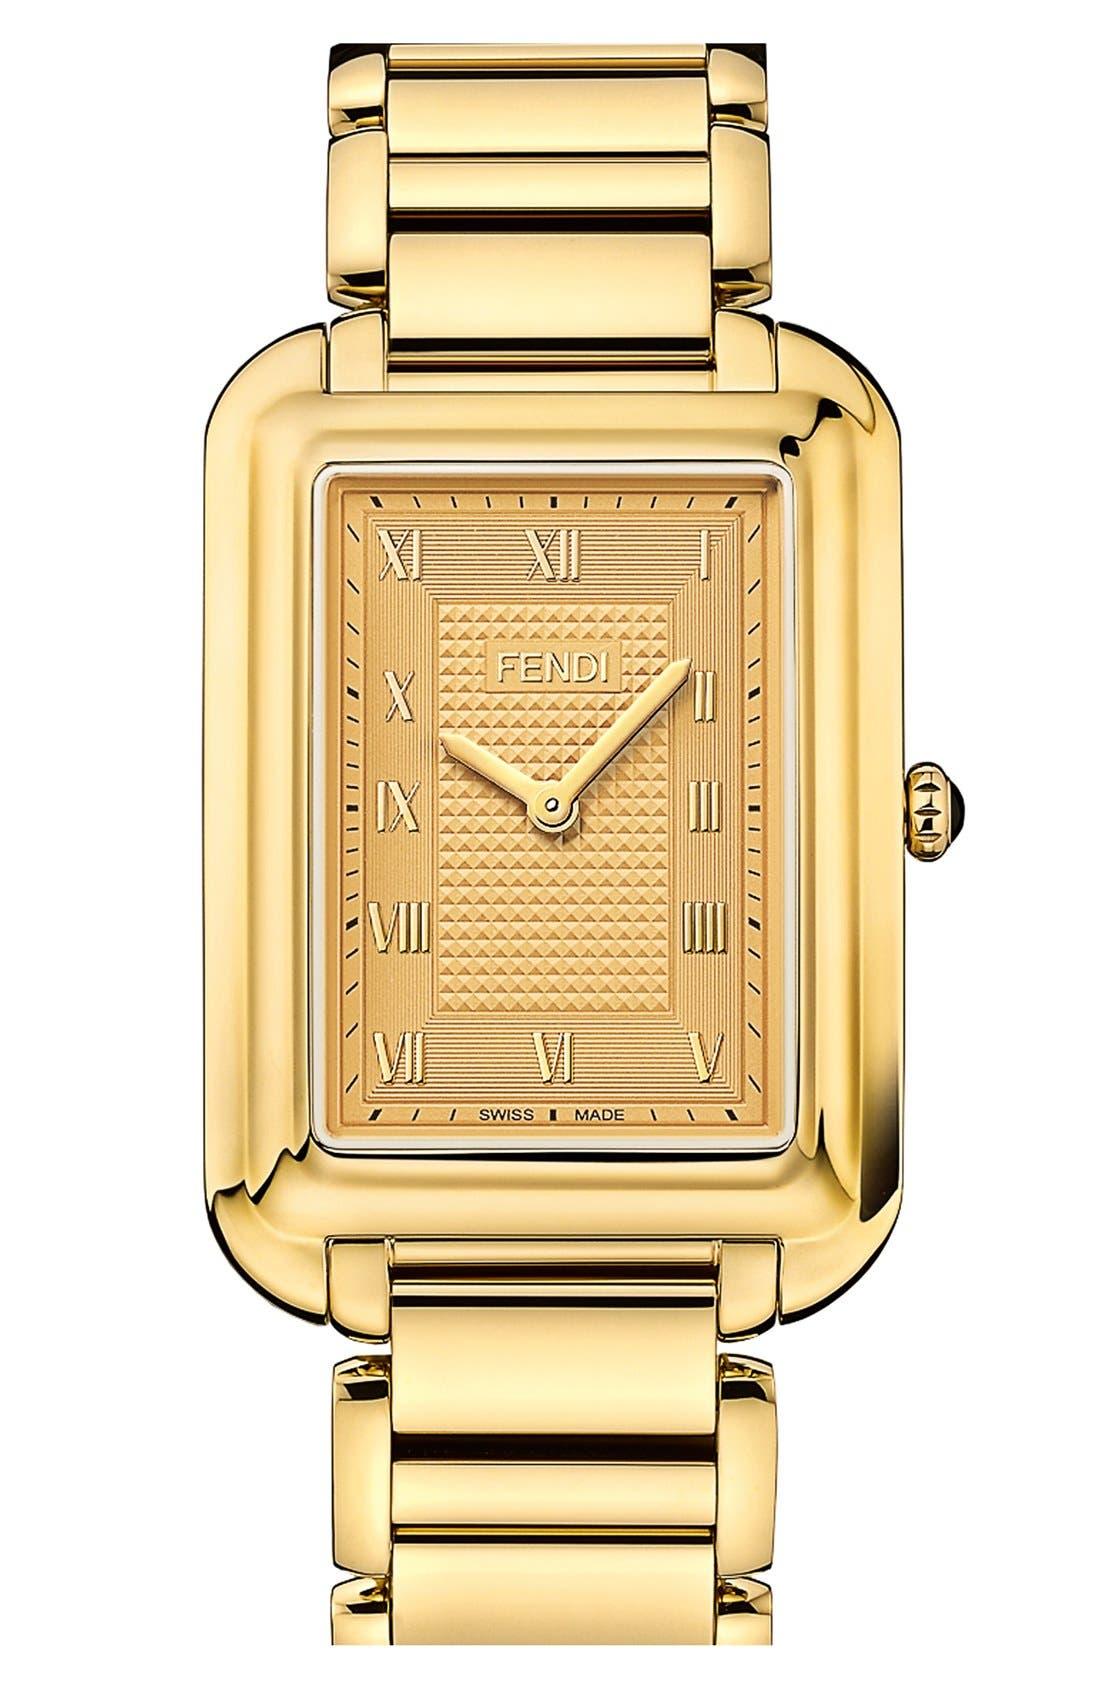 Main Image - Fendi 'Classico' Rectangular Bracelet Watch, 31mm x 38mm